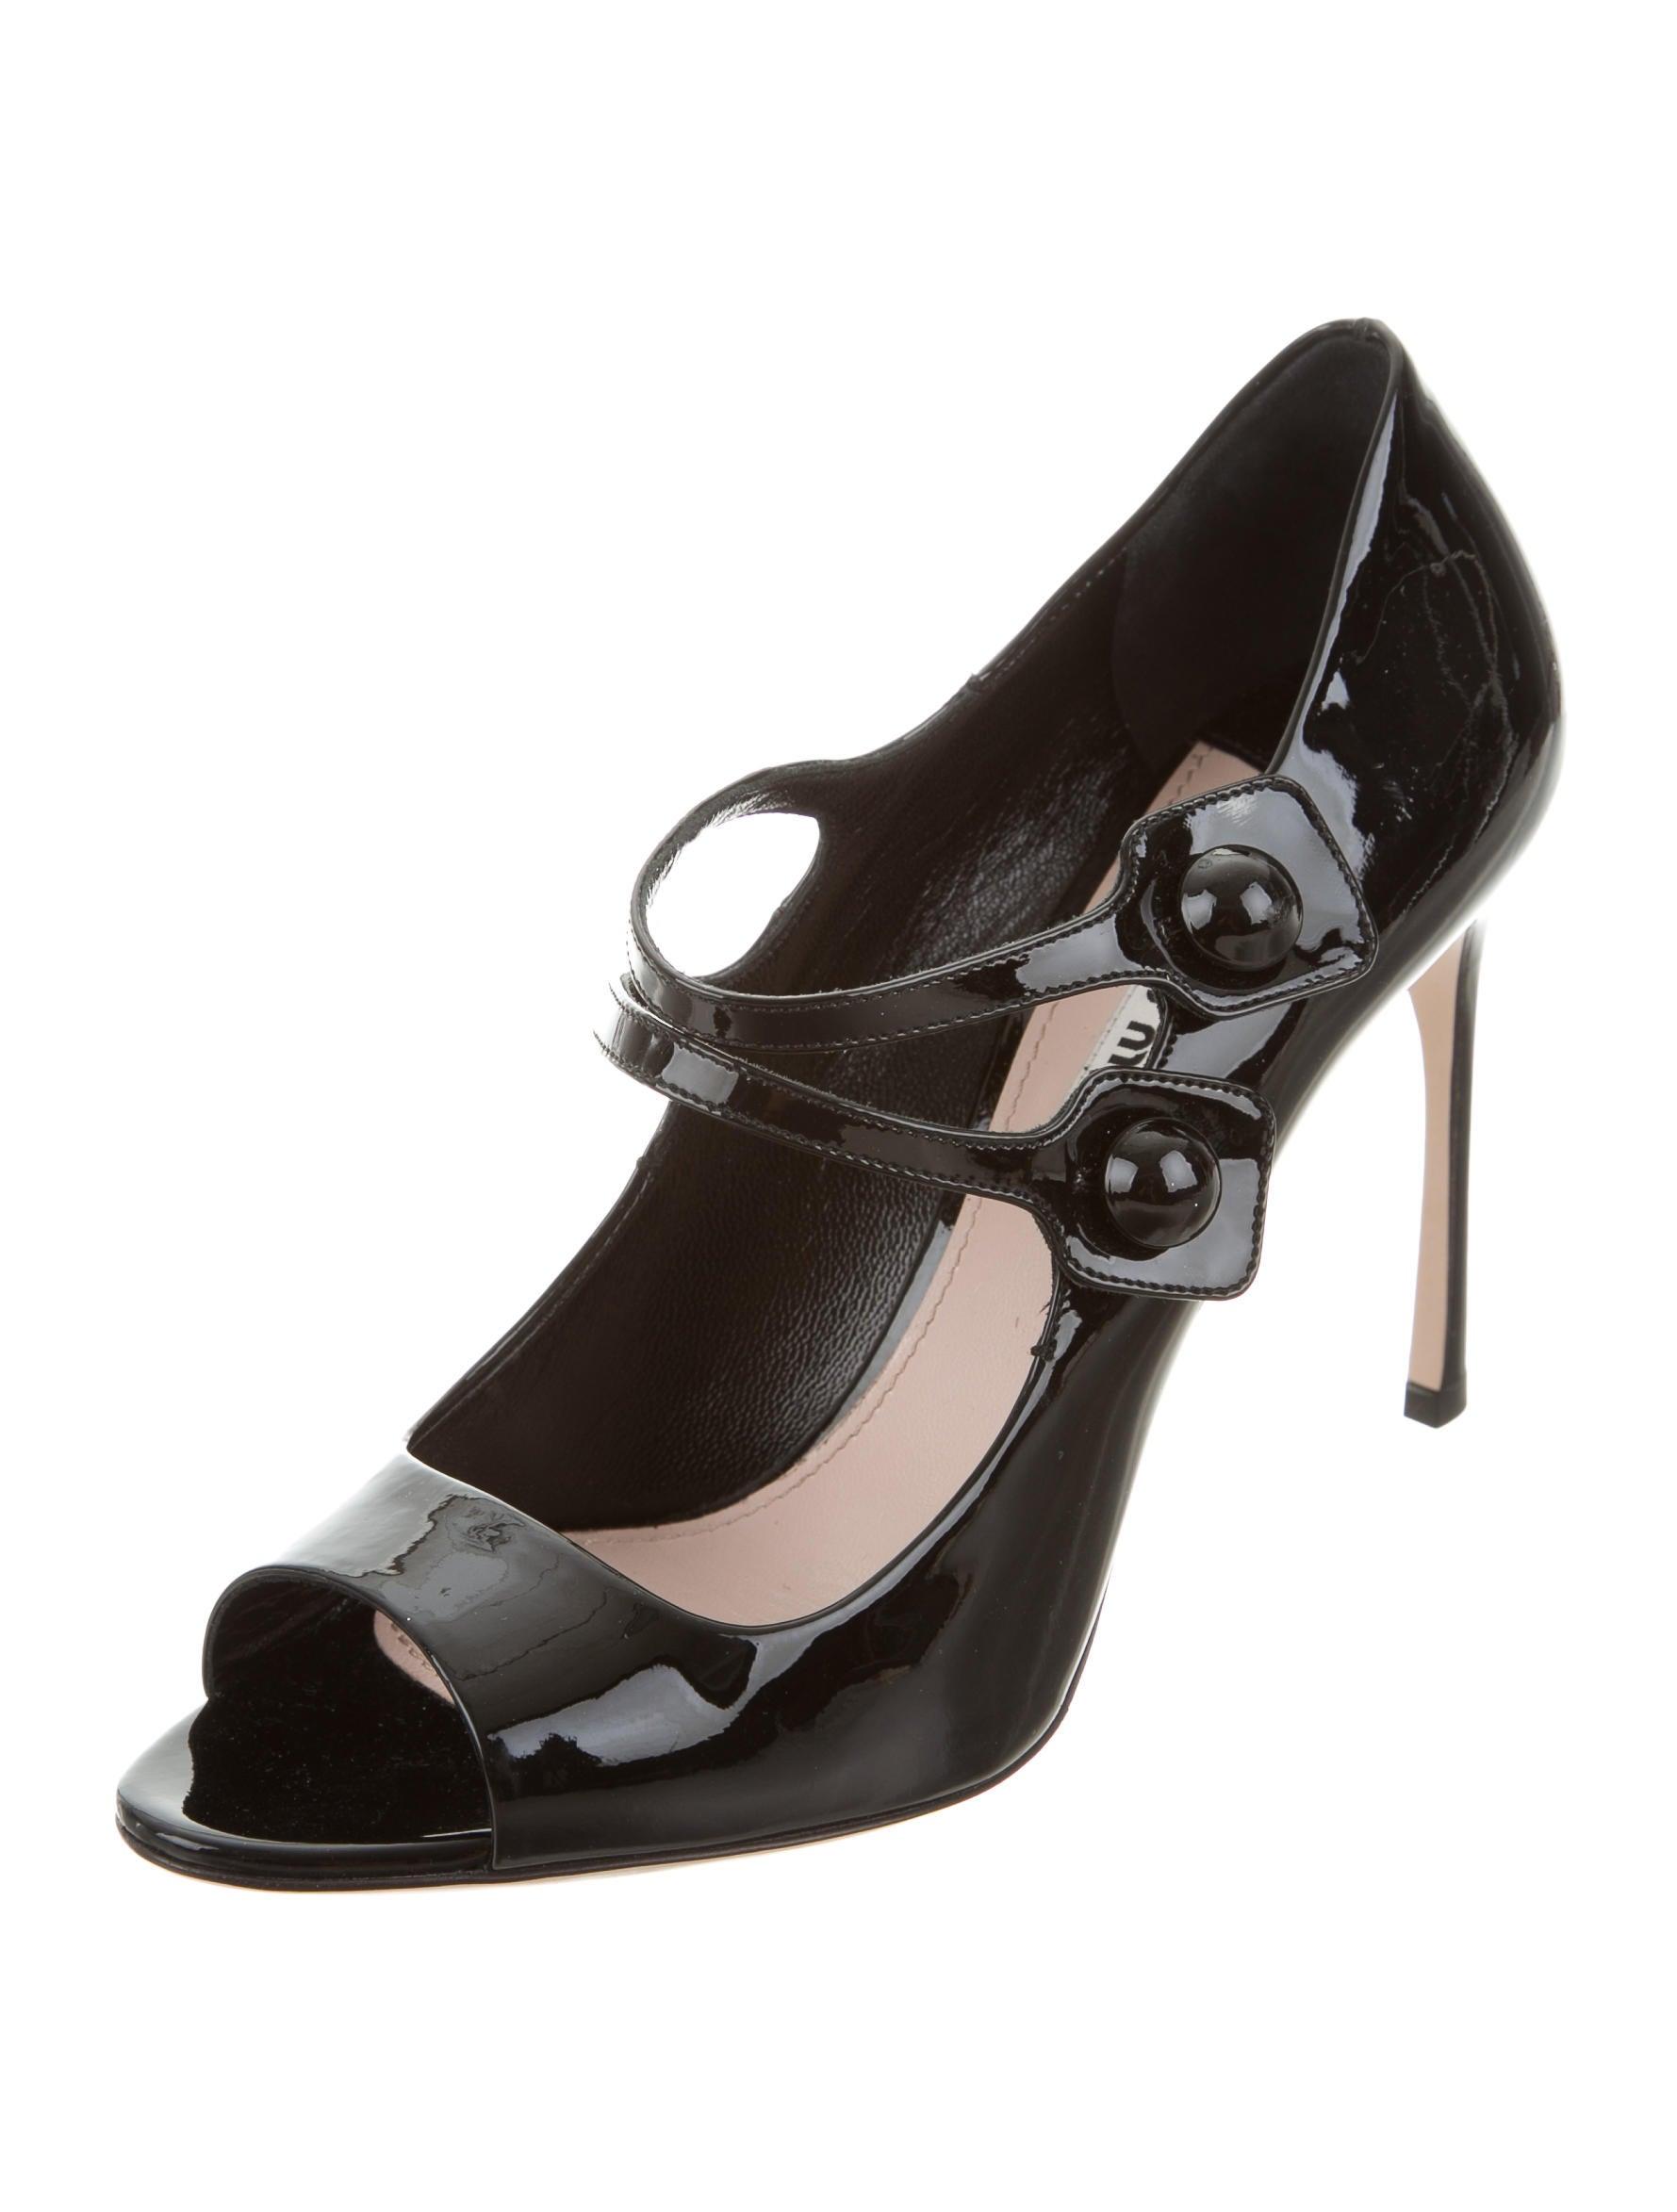 Miu Miu Patent Leather Mary Jane Pumps - Shoes - MIU50530   The RealReal